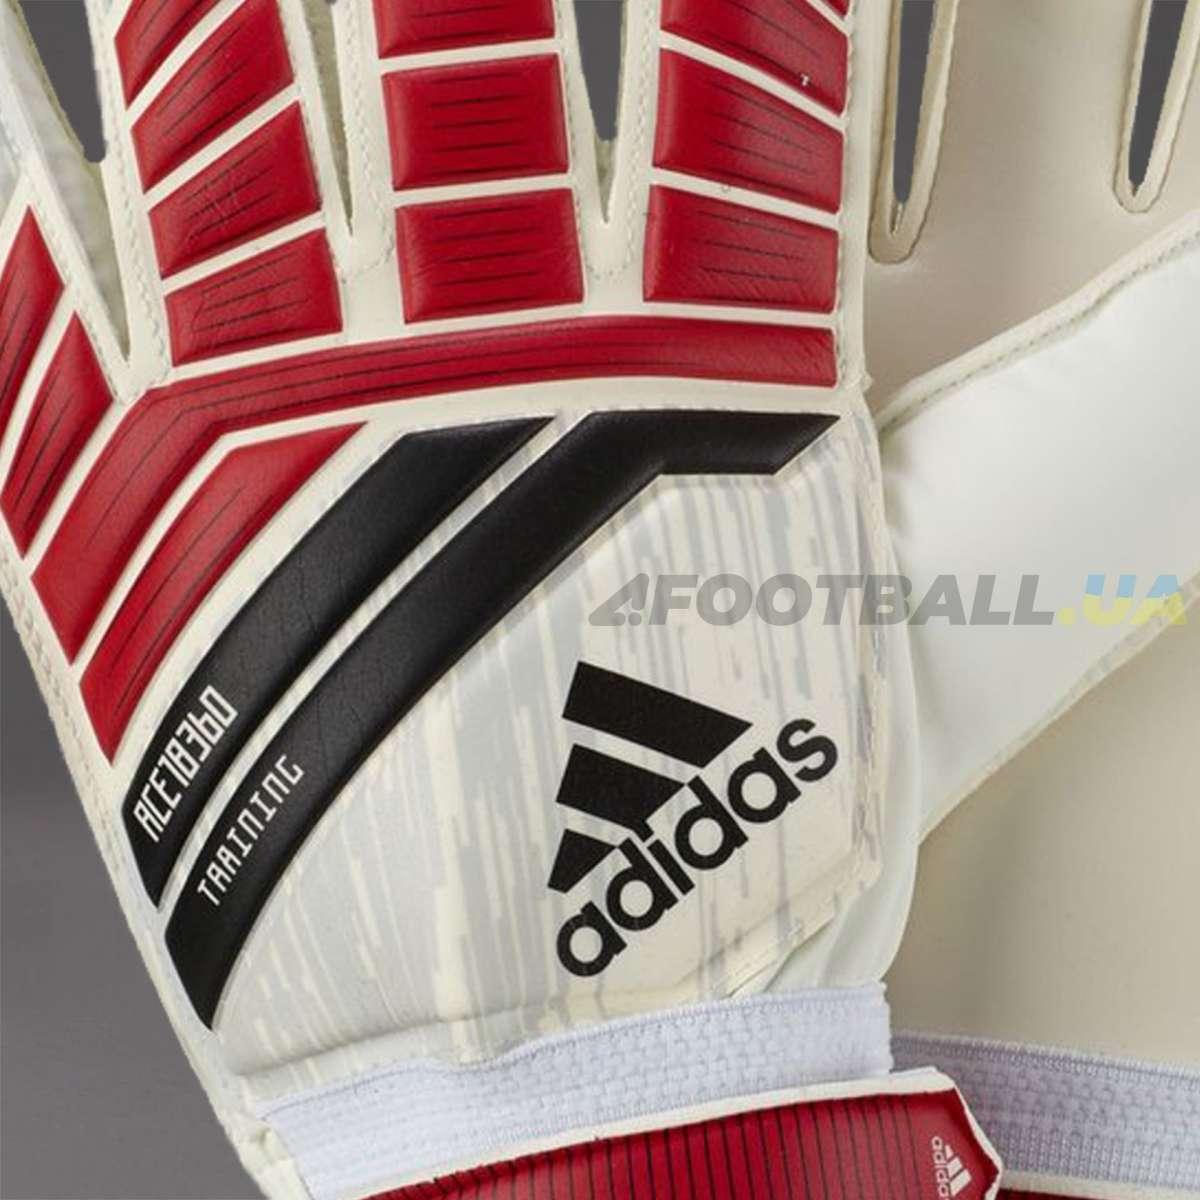 Вратарские перчатки adidas Predator 18 Training CF1366 Вратарские перчатки  adidas Predator 18 Training CF1366 2 ... dceac24707c6b